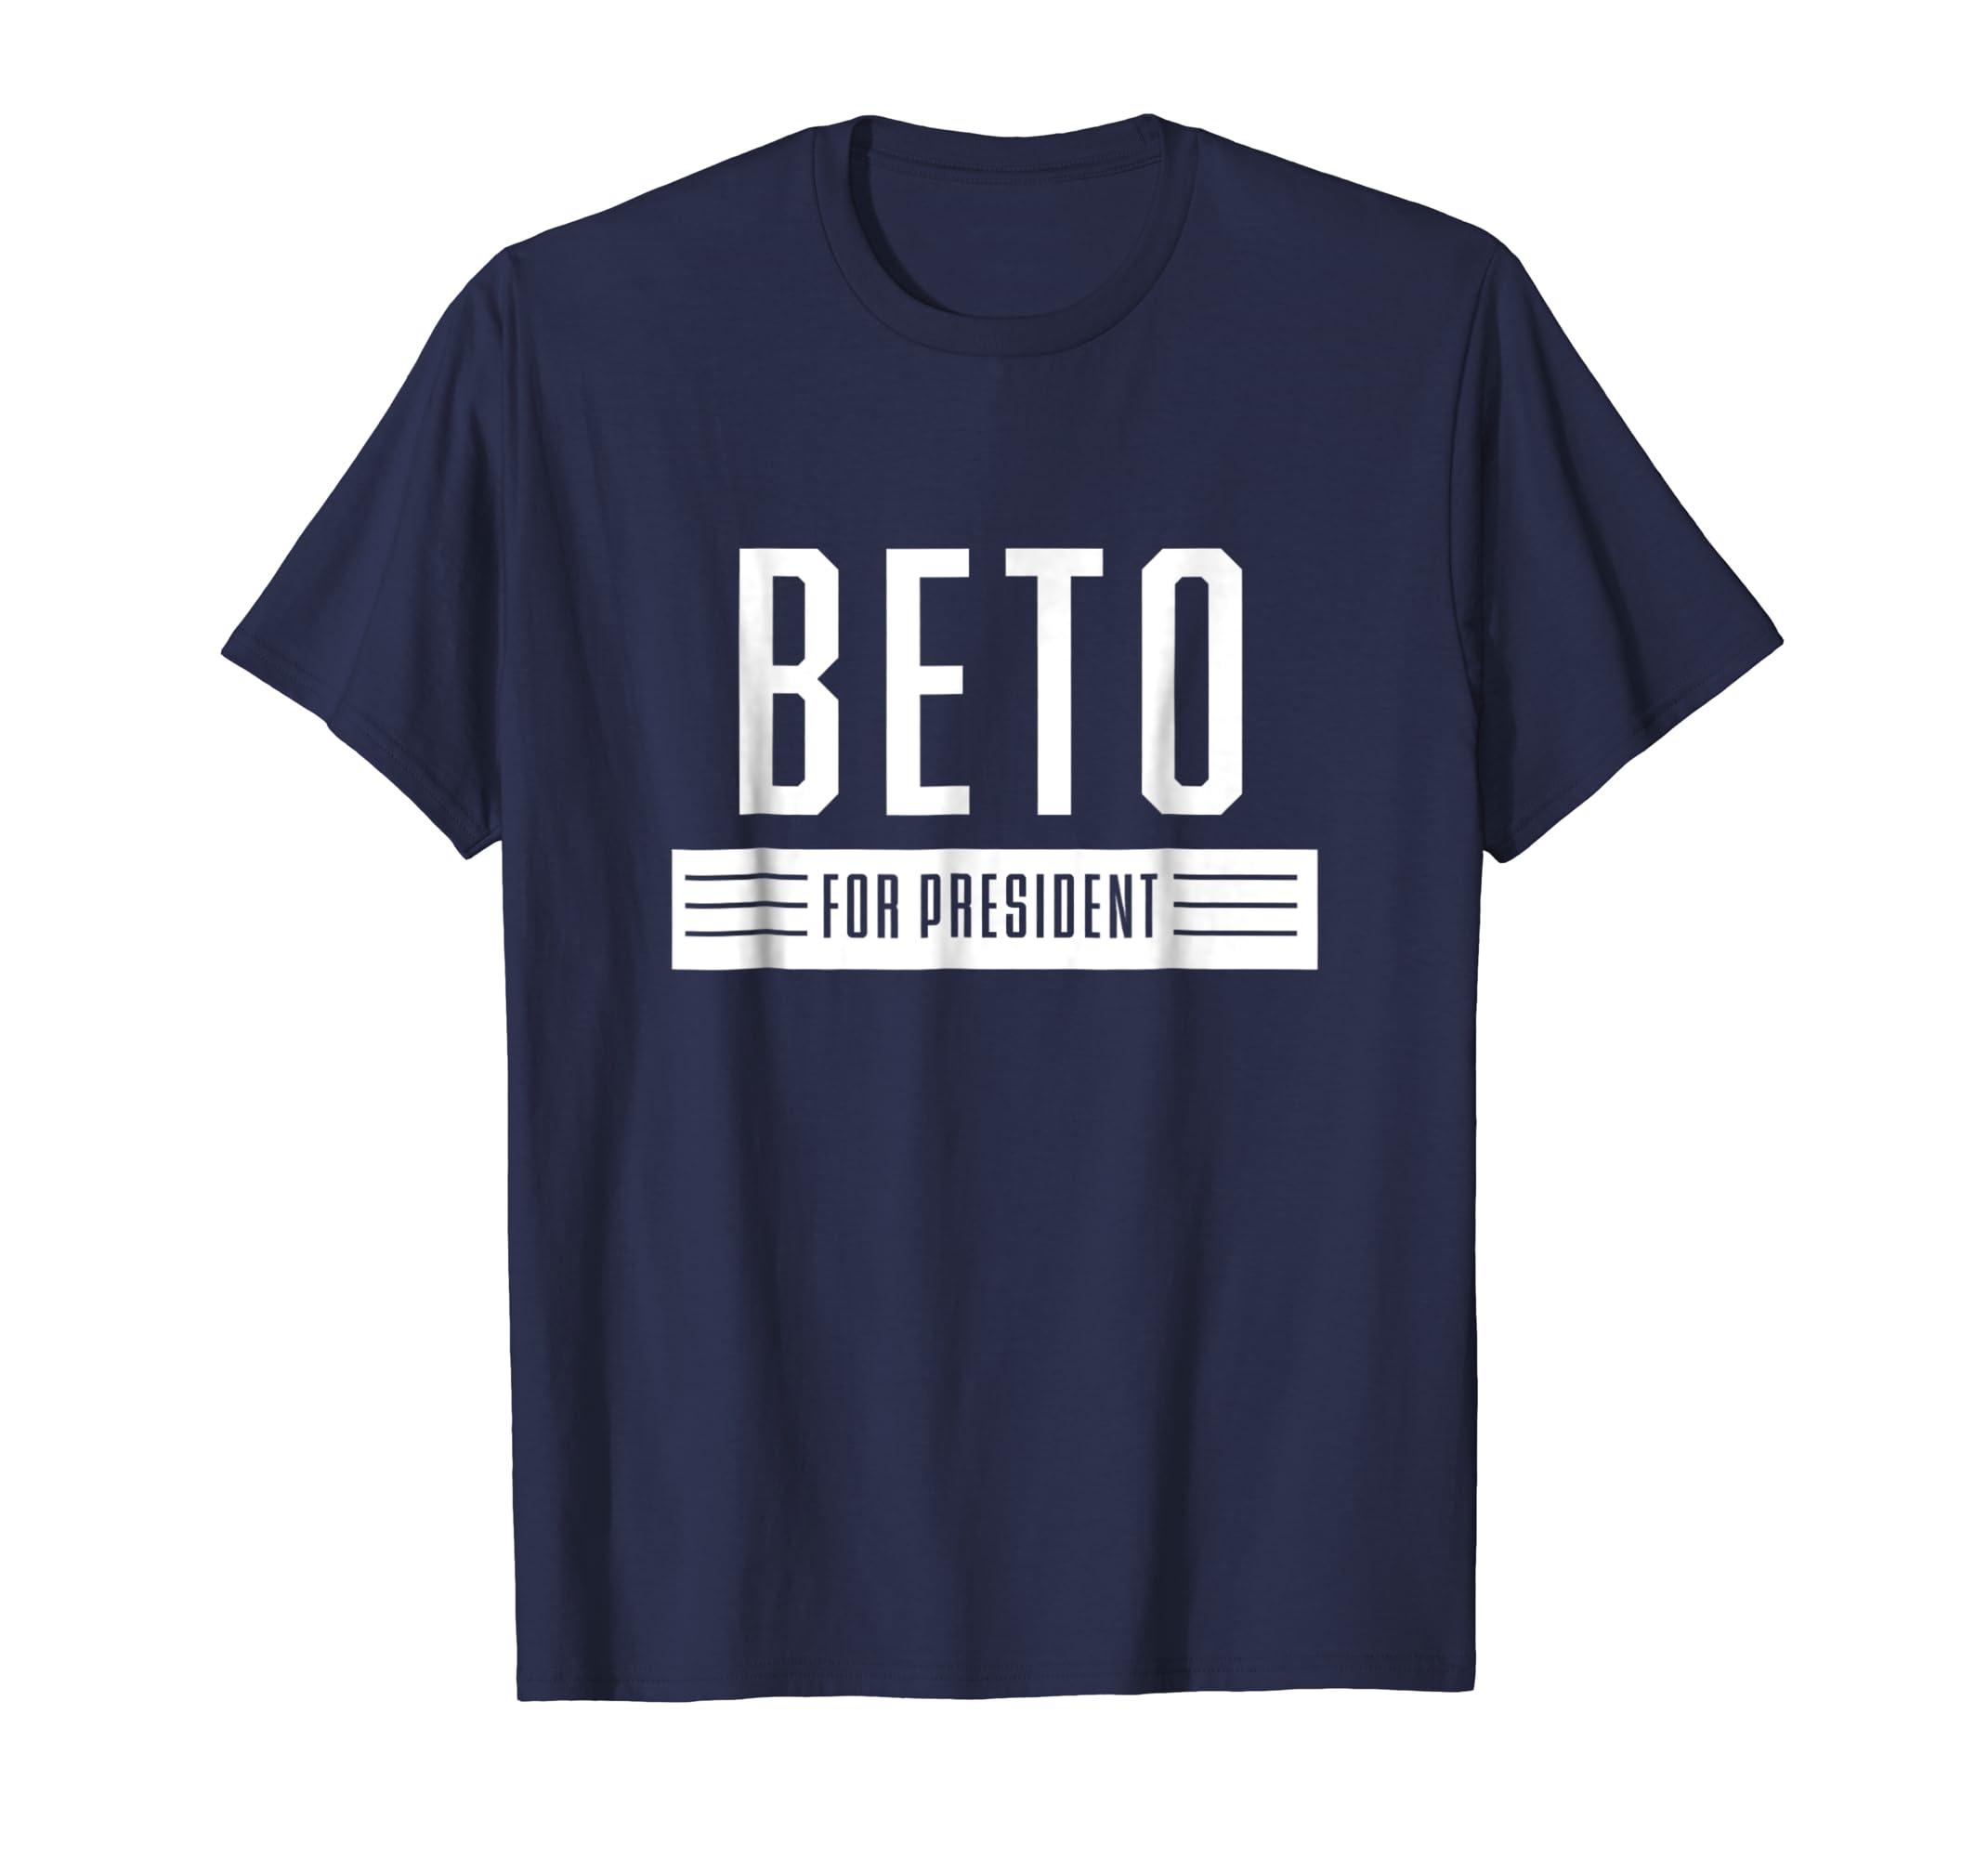 Beto For President 2020 USA Elections Shirt: Vote ORourke-azvn